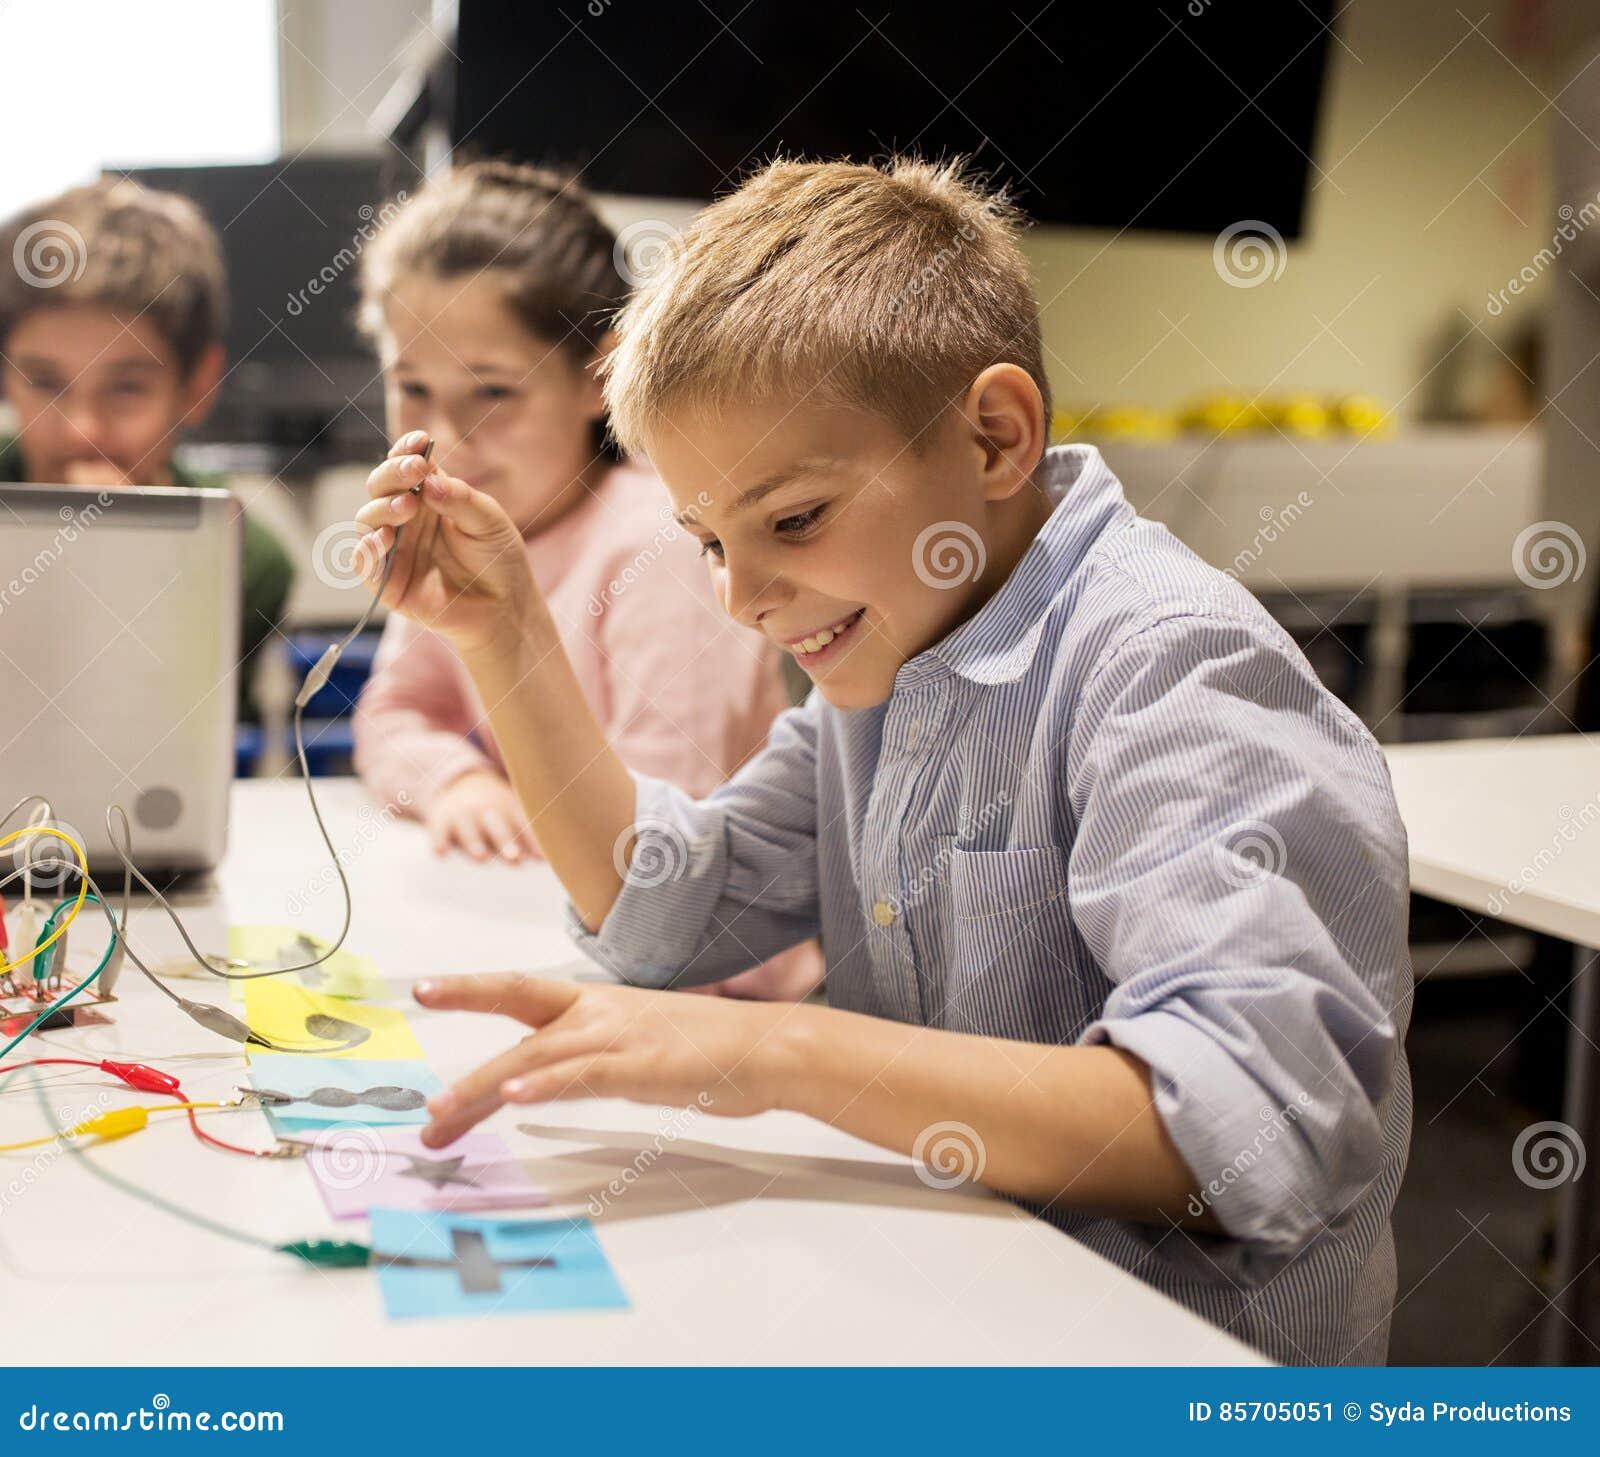 kids laptop  invention kit  robotics school stock image image